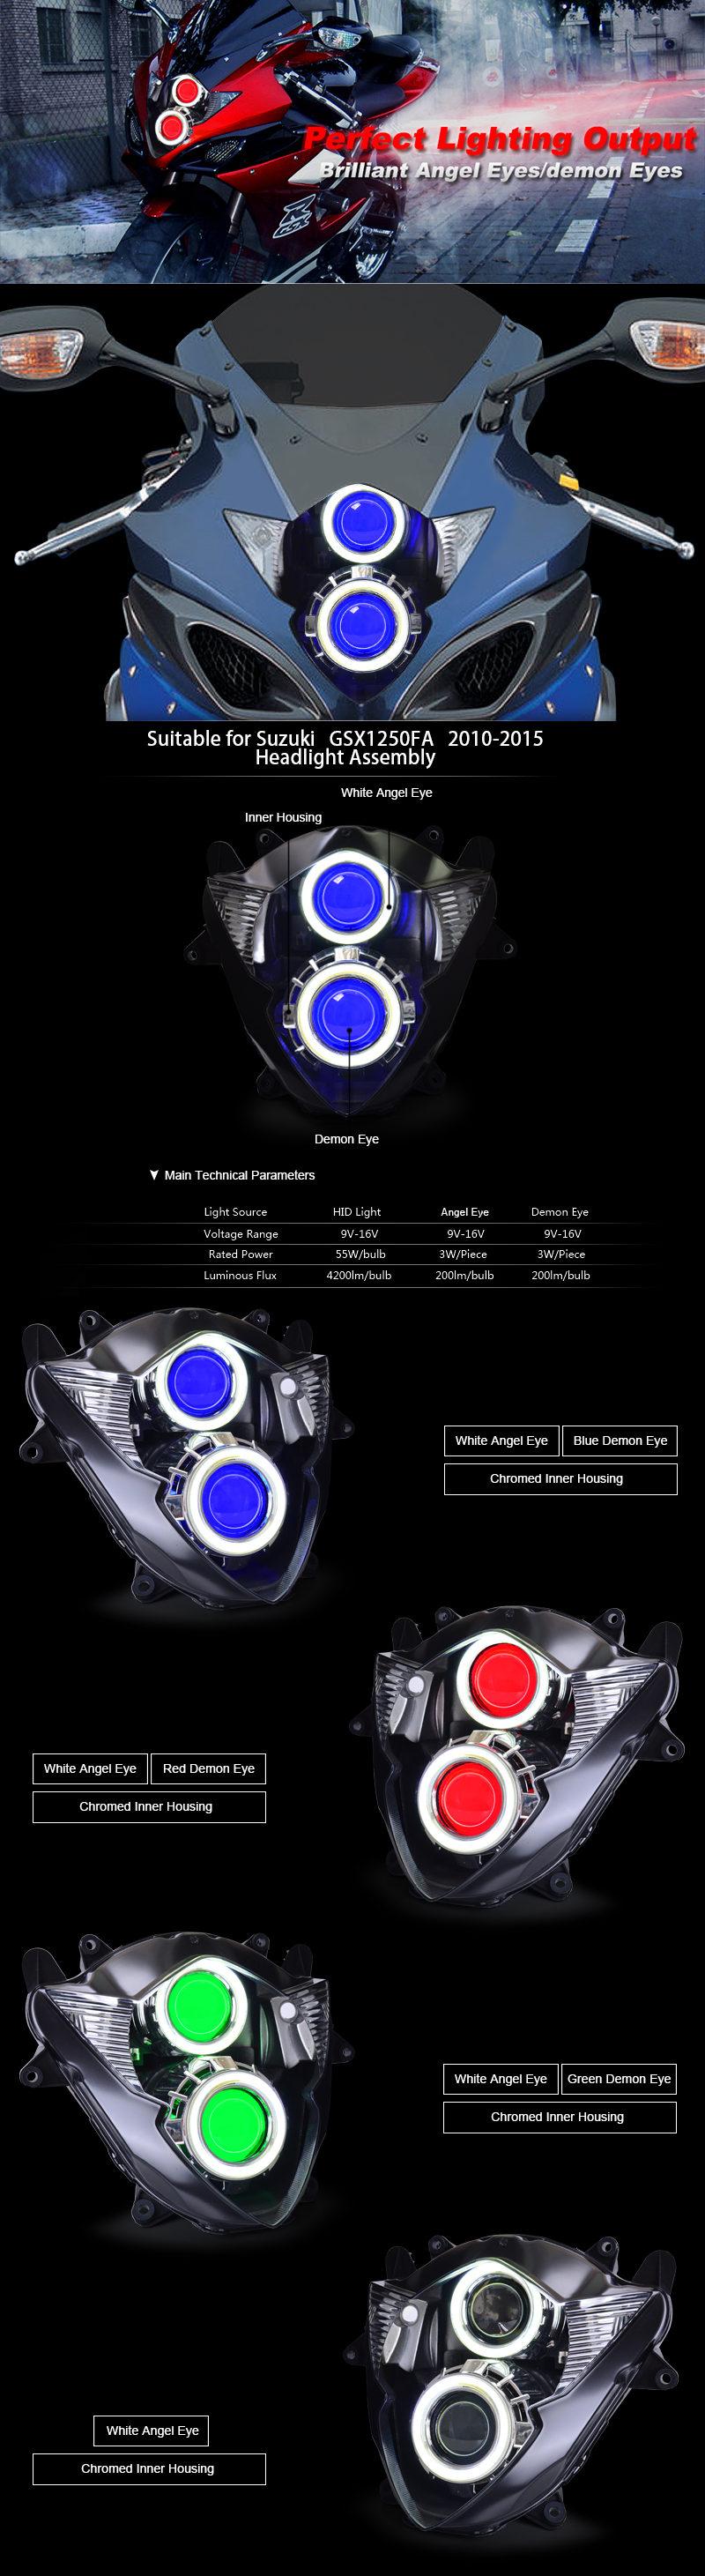 Suzuki GSX1250F Headlight 2010 2011 2012 2013 2014 2015